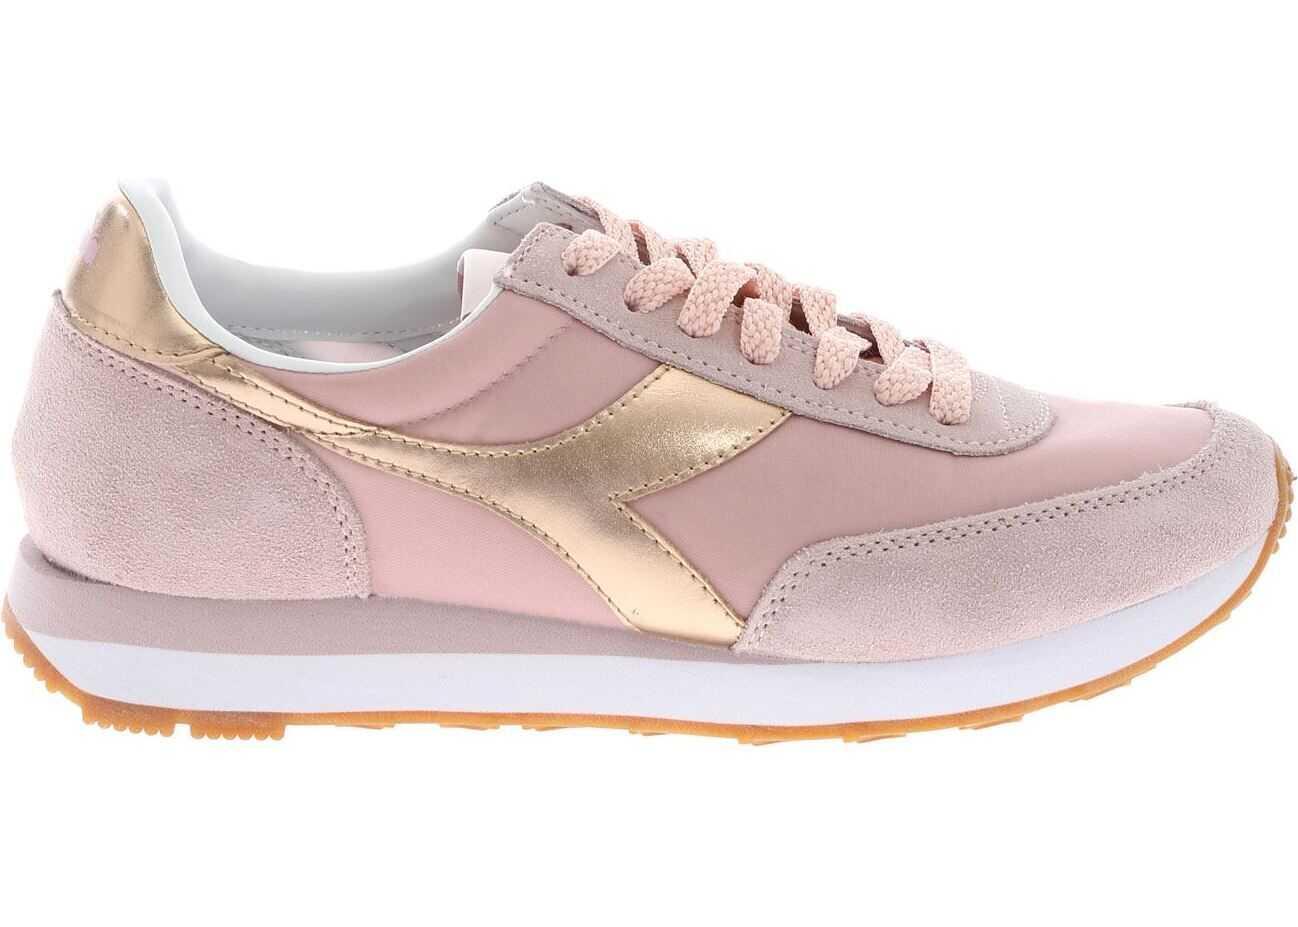 Diadora Heritage Koala H Metallica Sneakers In Pink Pink